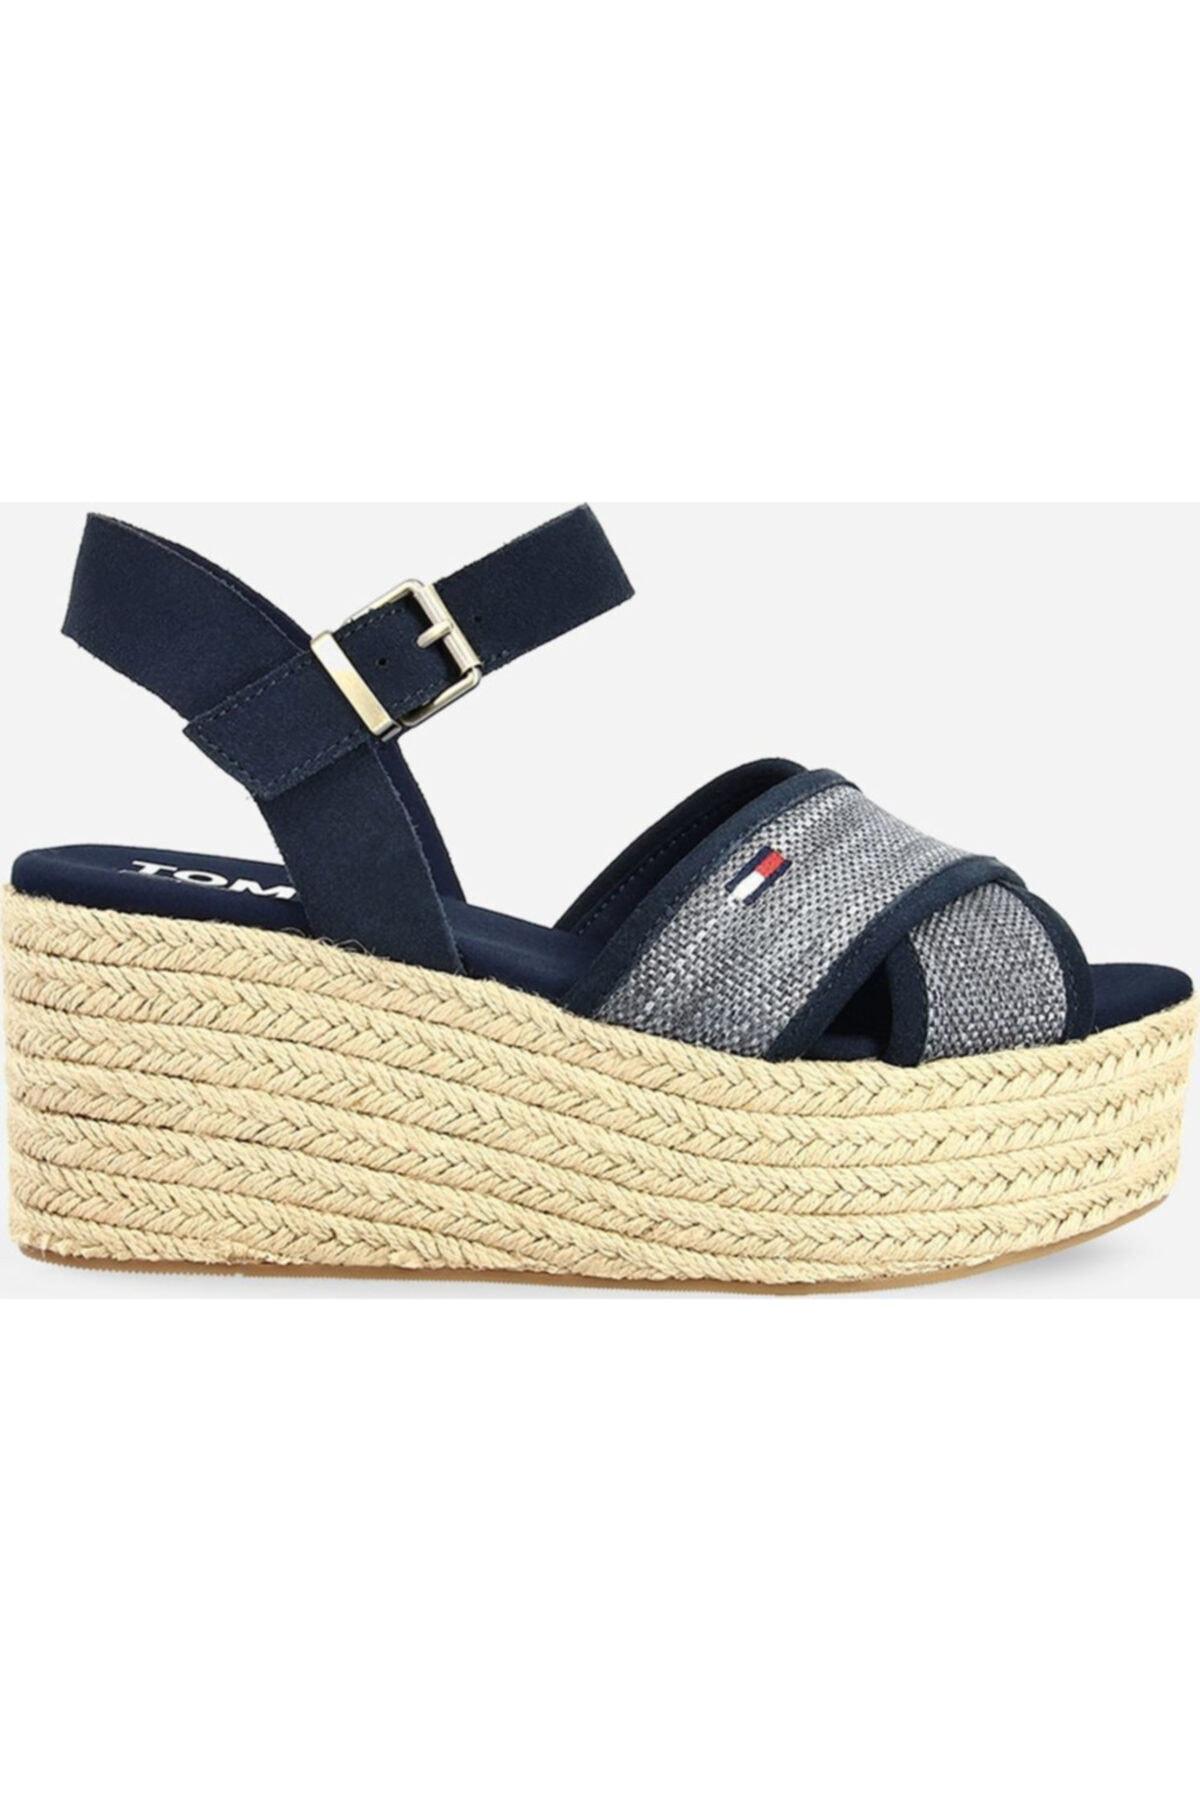 Tommy Hilfiger Kadın Lacivert Dolgu Topuk Sandalet En0en00910-c87 1